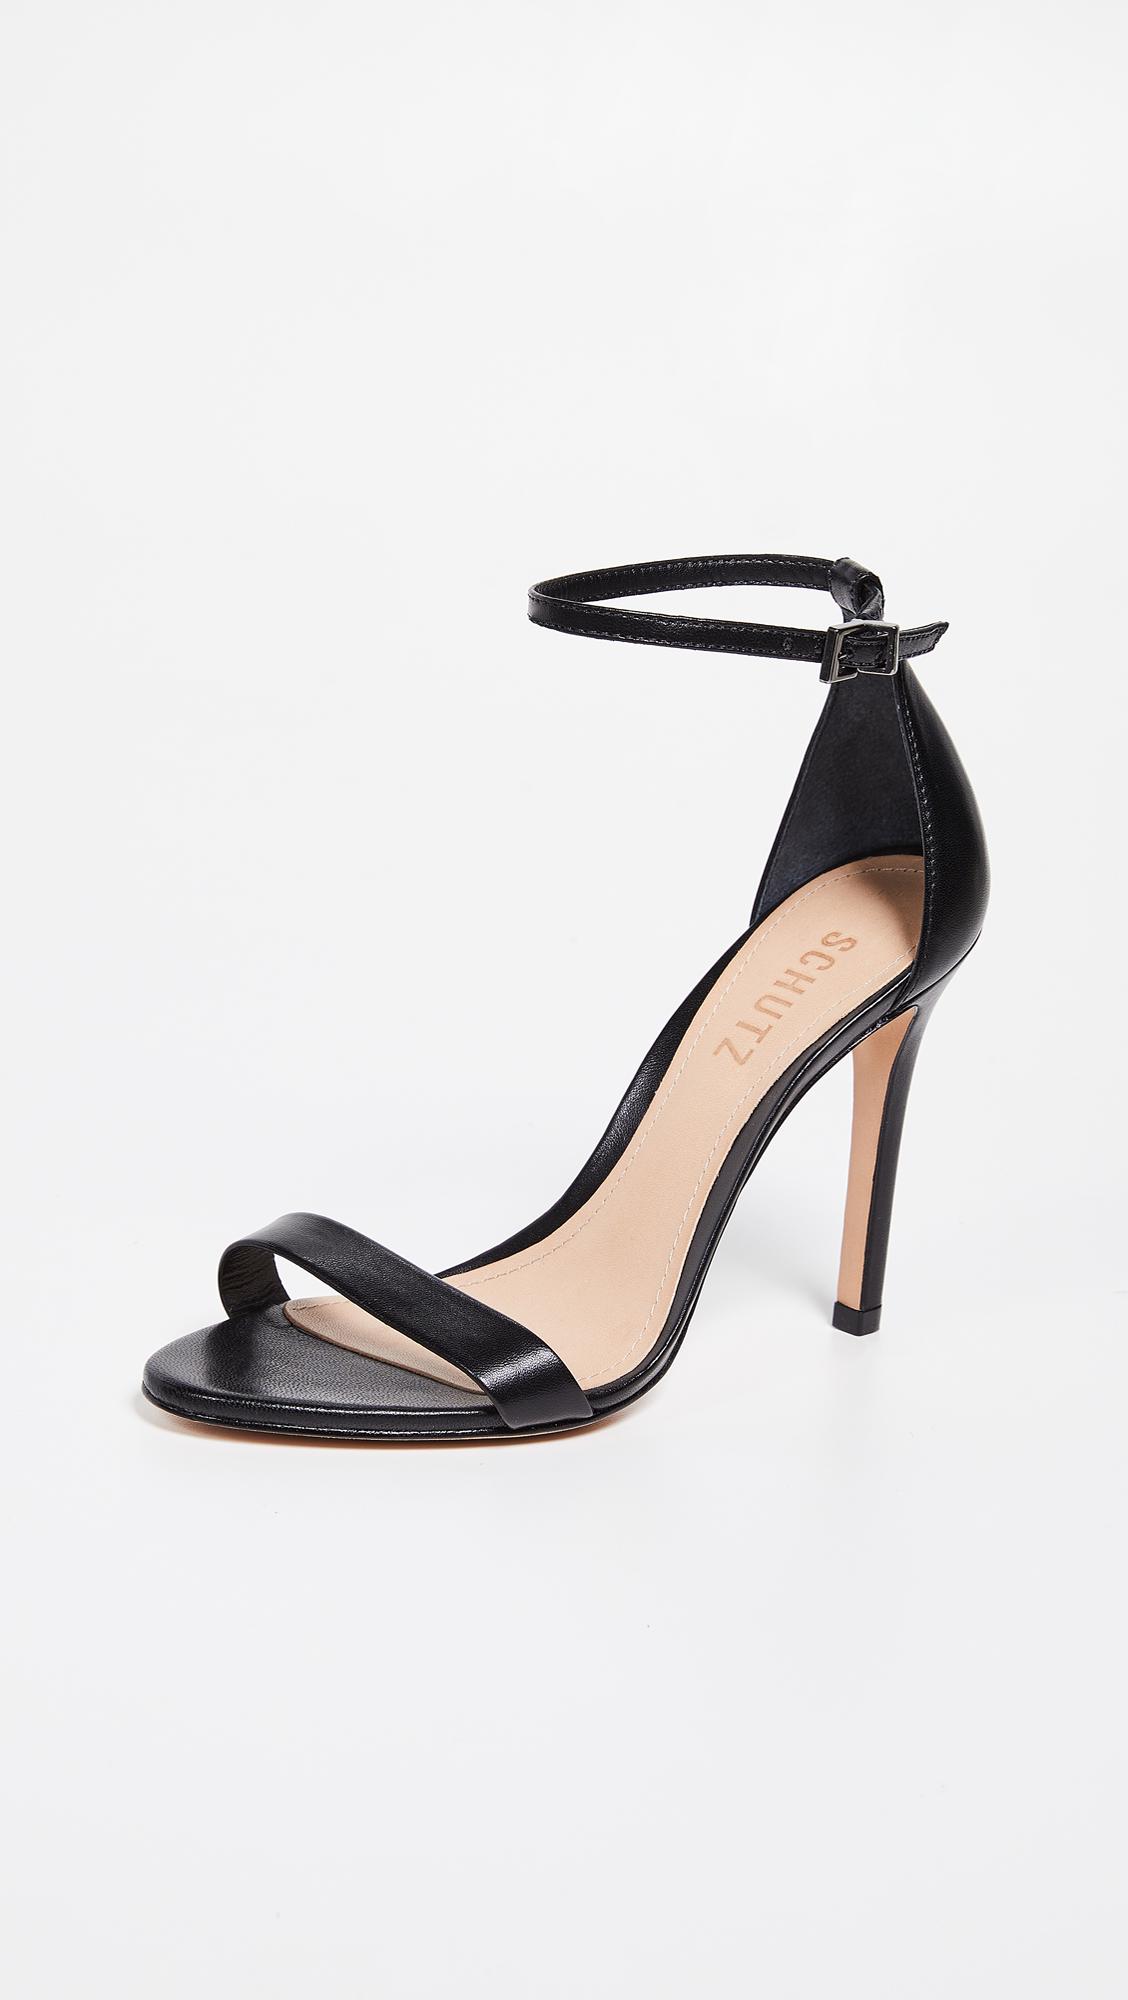 Black Stiletto Sandals, $160, Shopbop